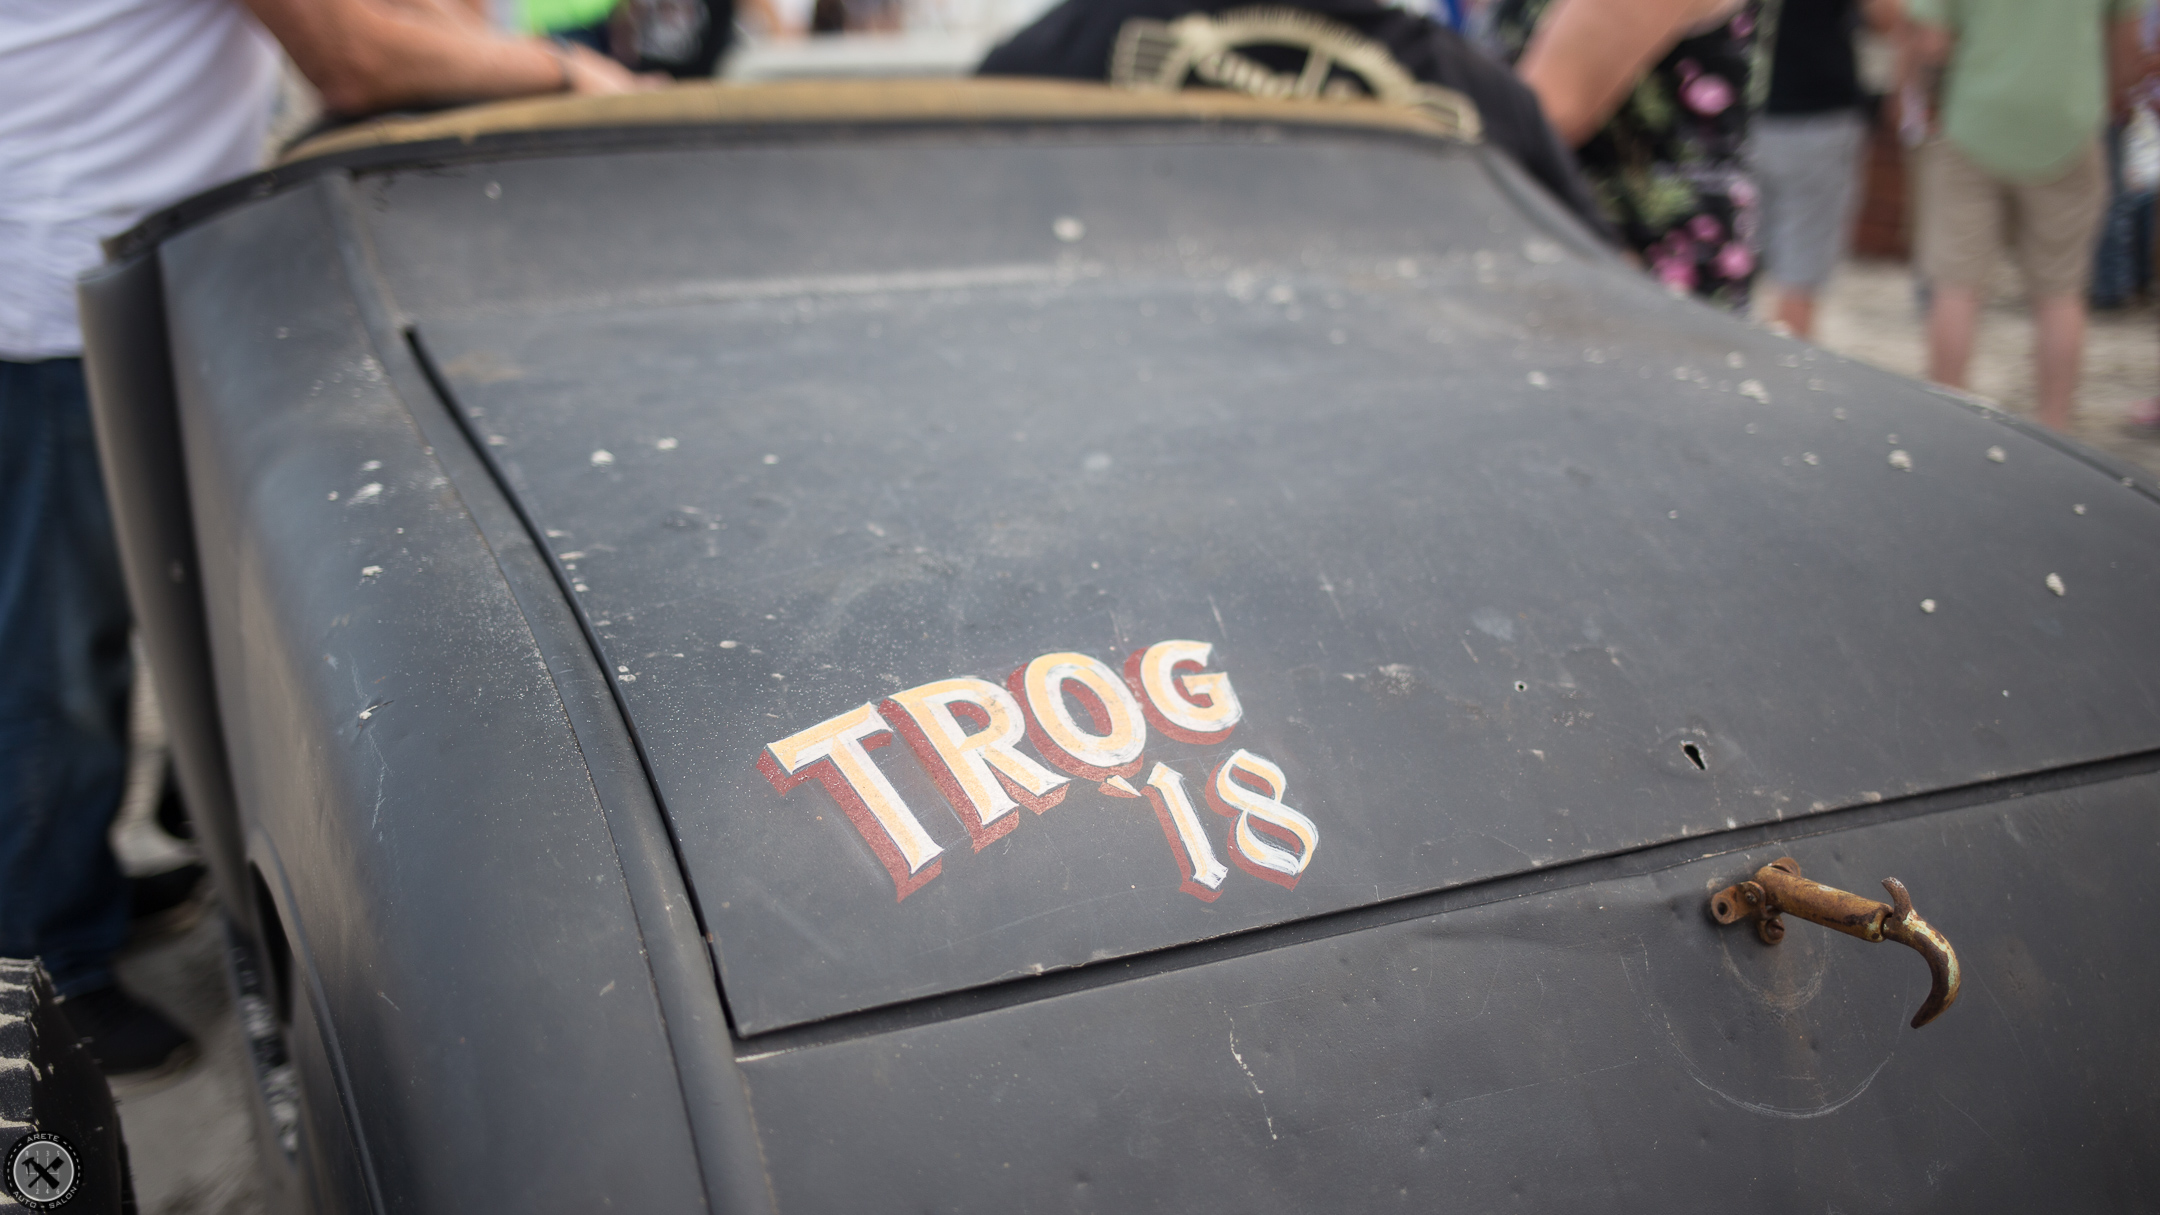 TROG_039.jpg